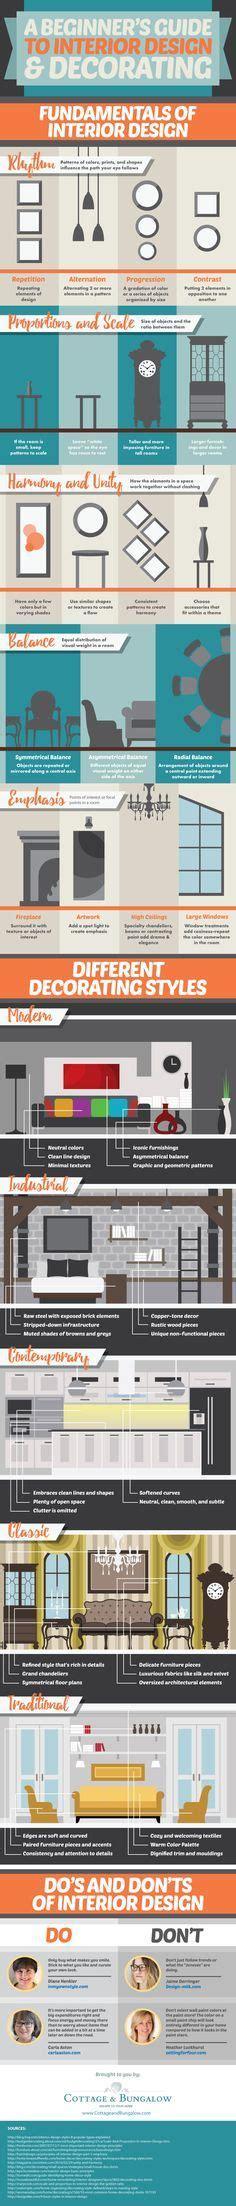 window terminology interior design infographics blueprint symbols free glossary floor plan symbols for